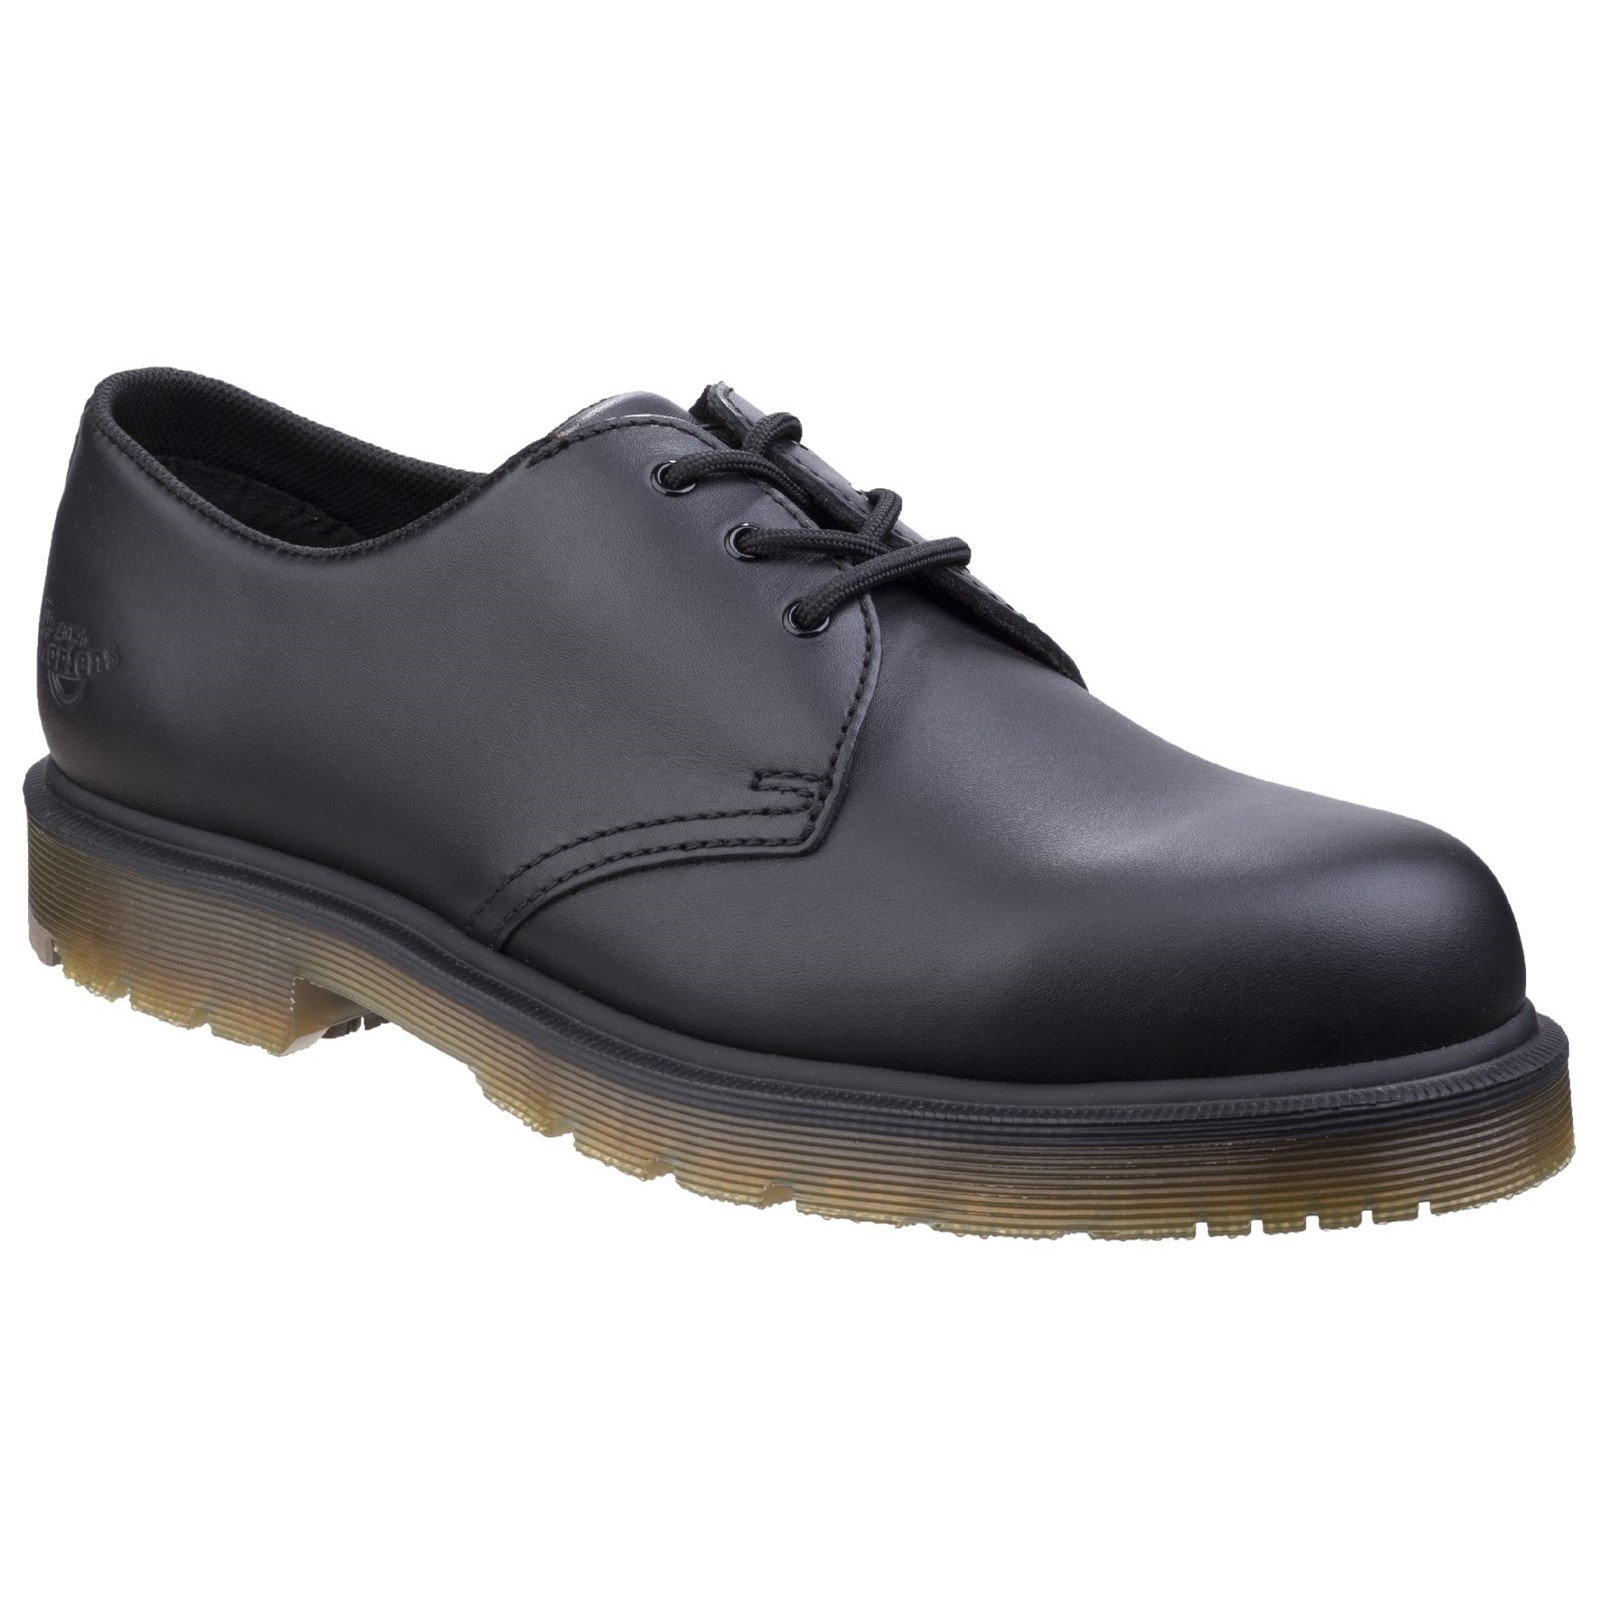 Dr Martens Men's Arlington NS Derby Shoe Black 26781 - Black Industrial Full Grain 8